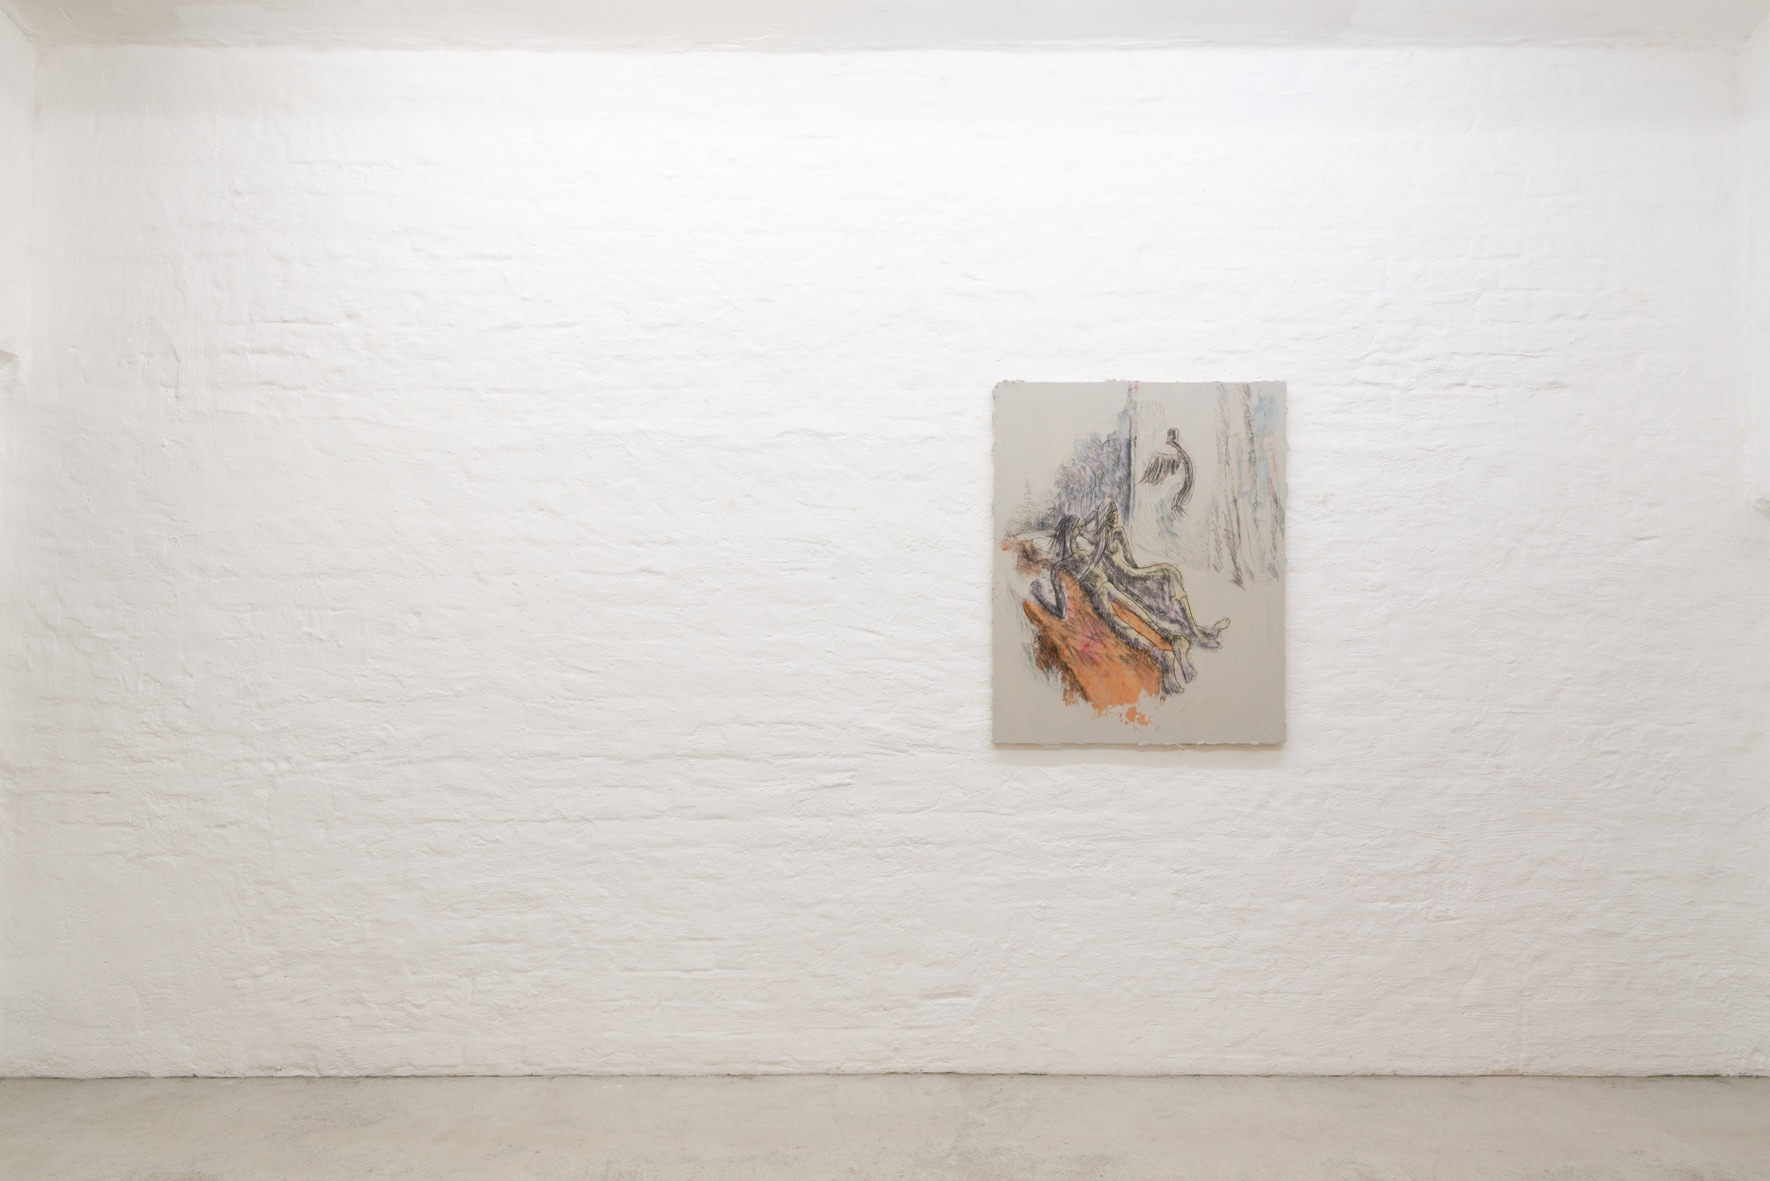 Exhibition view (Emi Mizukami, humming bird, still alive, Acrylic and graphite on canvas, 100 x 80.5 cm, 2020)